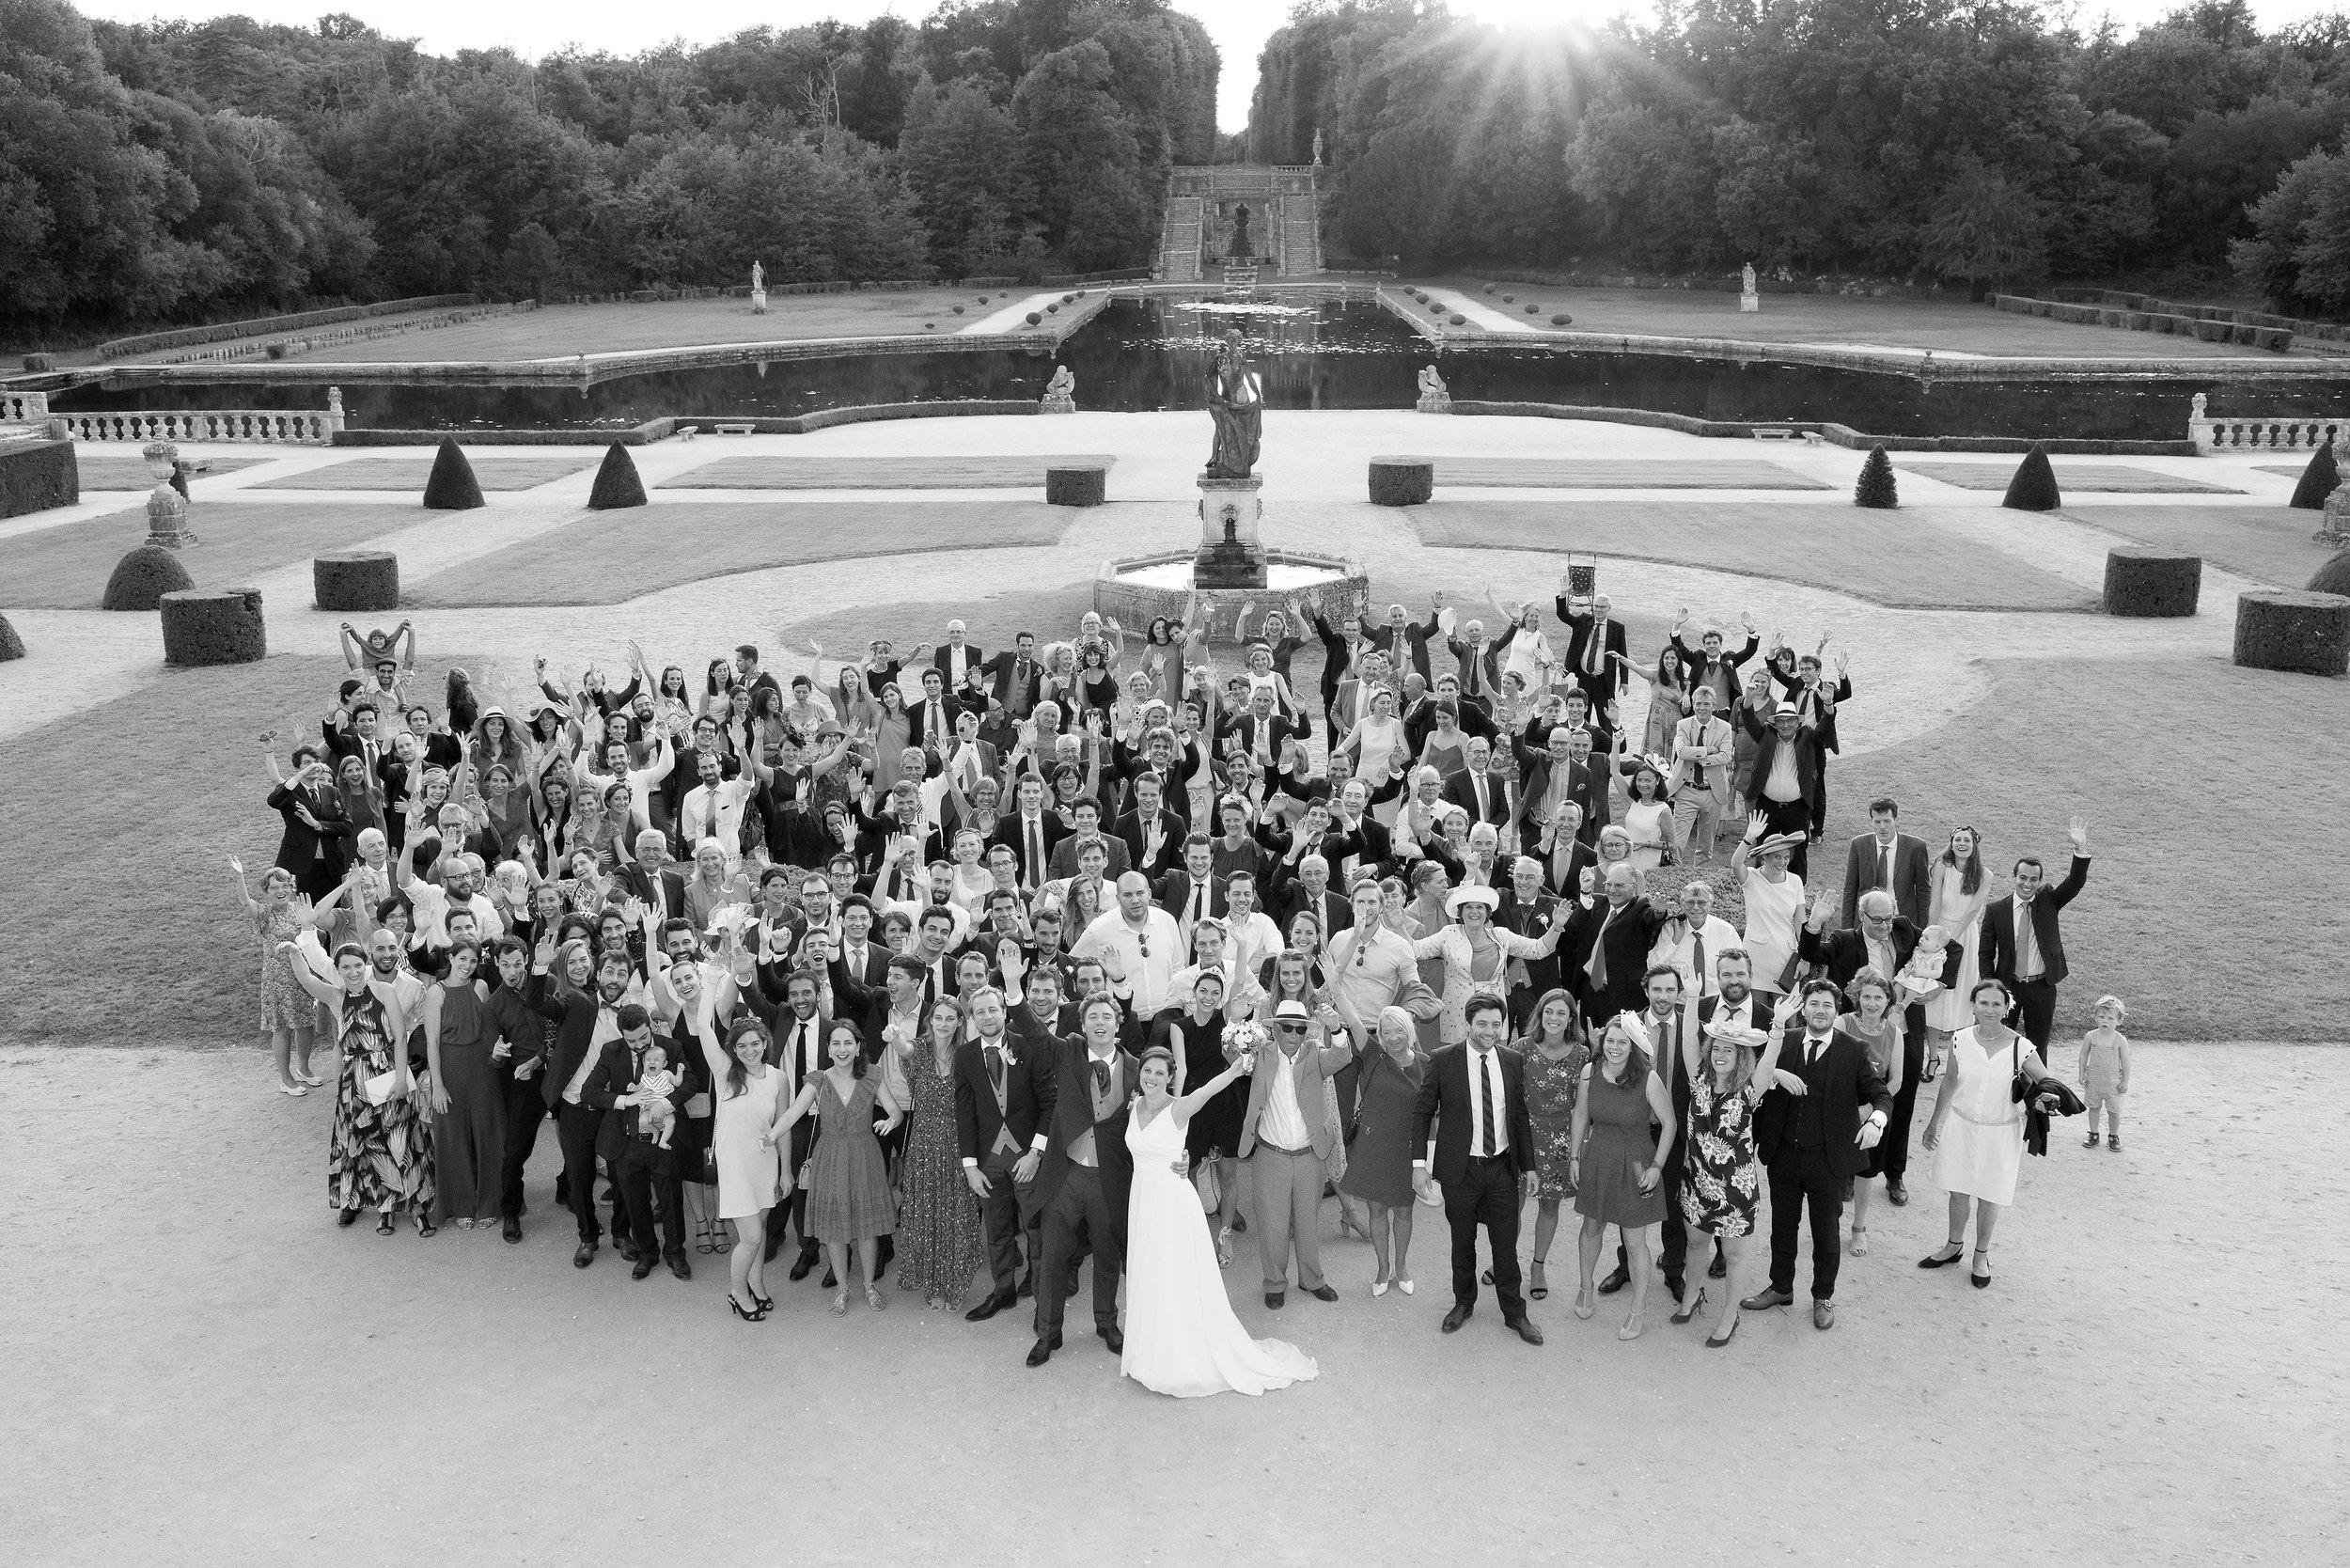 photographe-mariage-chateau-la-roche-courbon-458.jpg